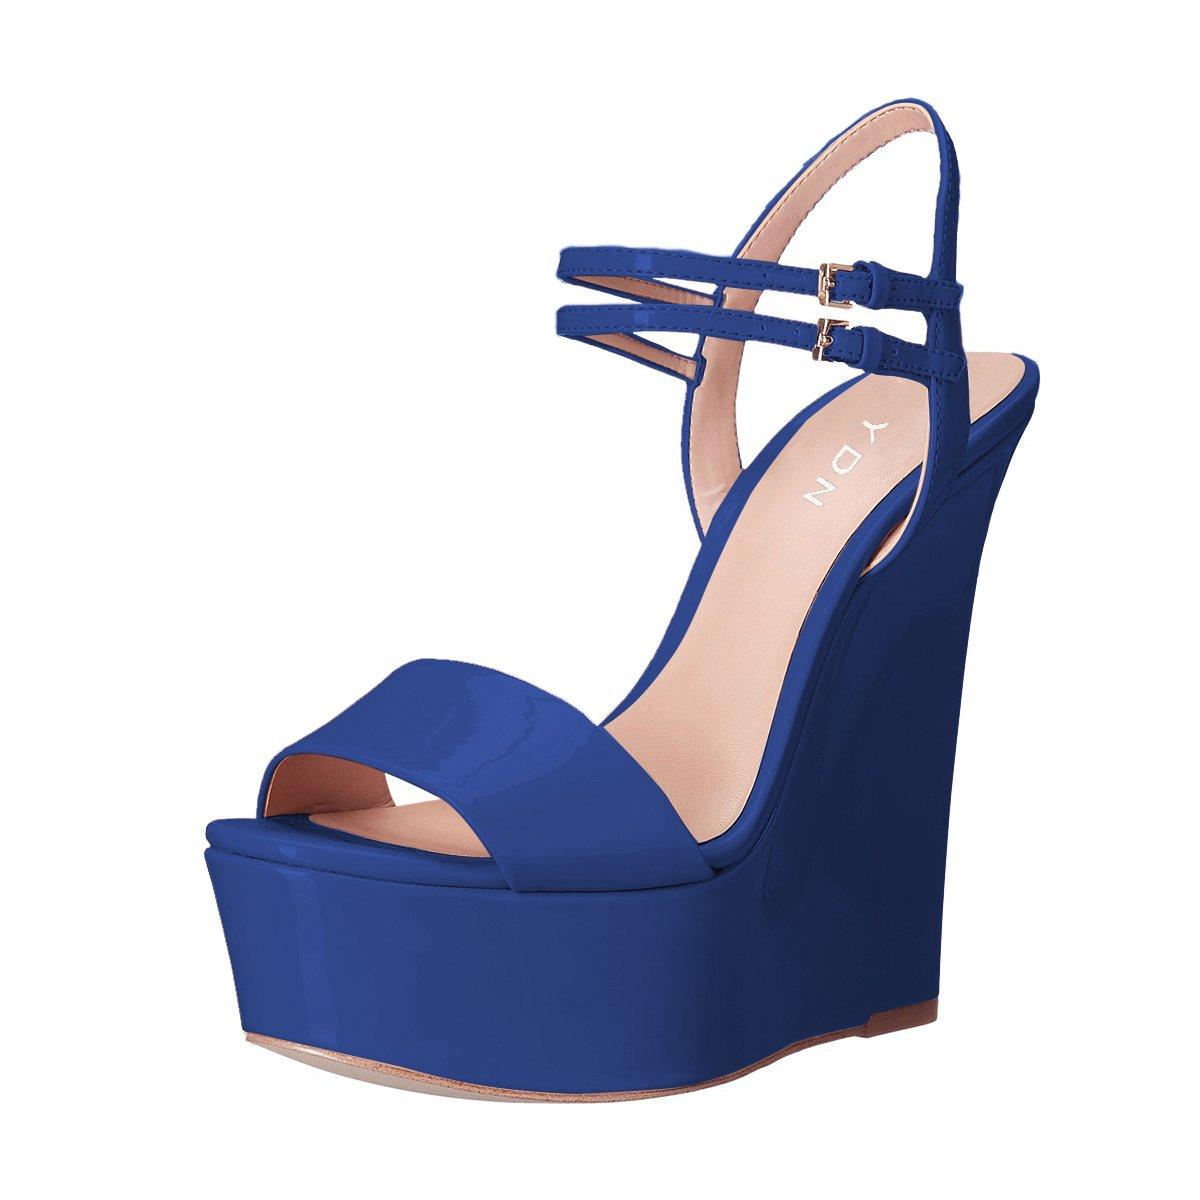 YDN Women Peep Toe High Heel Wedge Sandals Ankle Straps Platform Pumps Slingback Shoes B07D6ND9K9 10 B(M) US|Blue